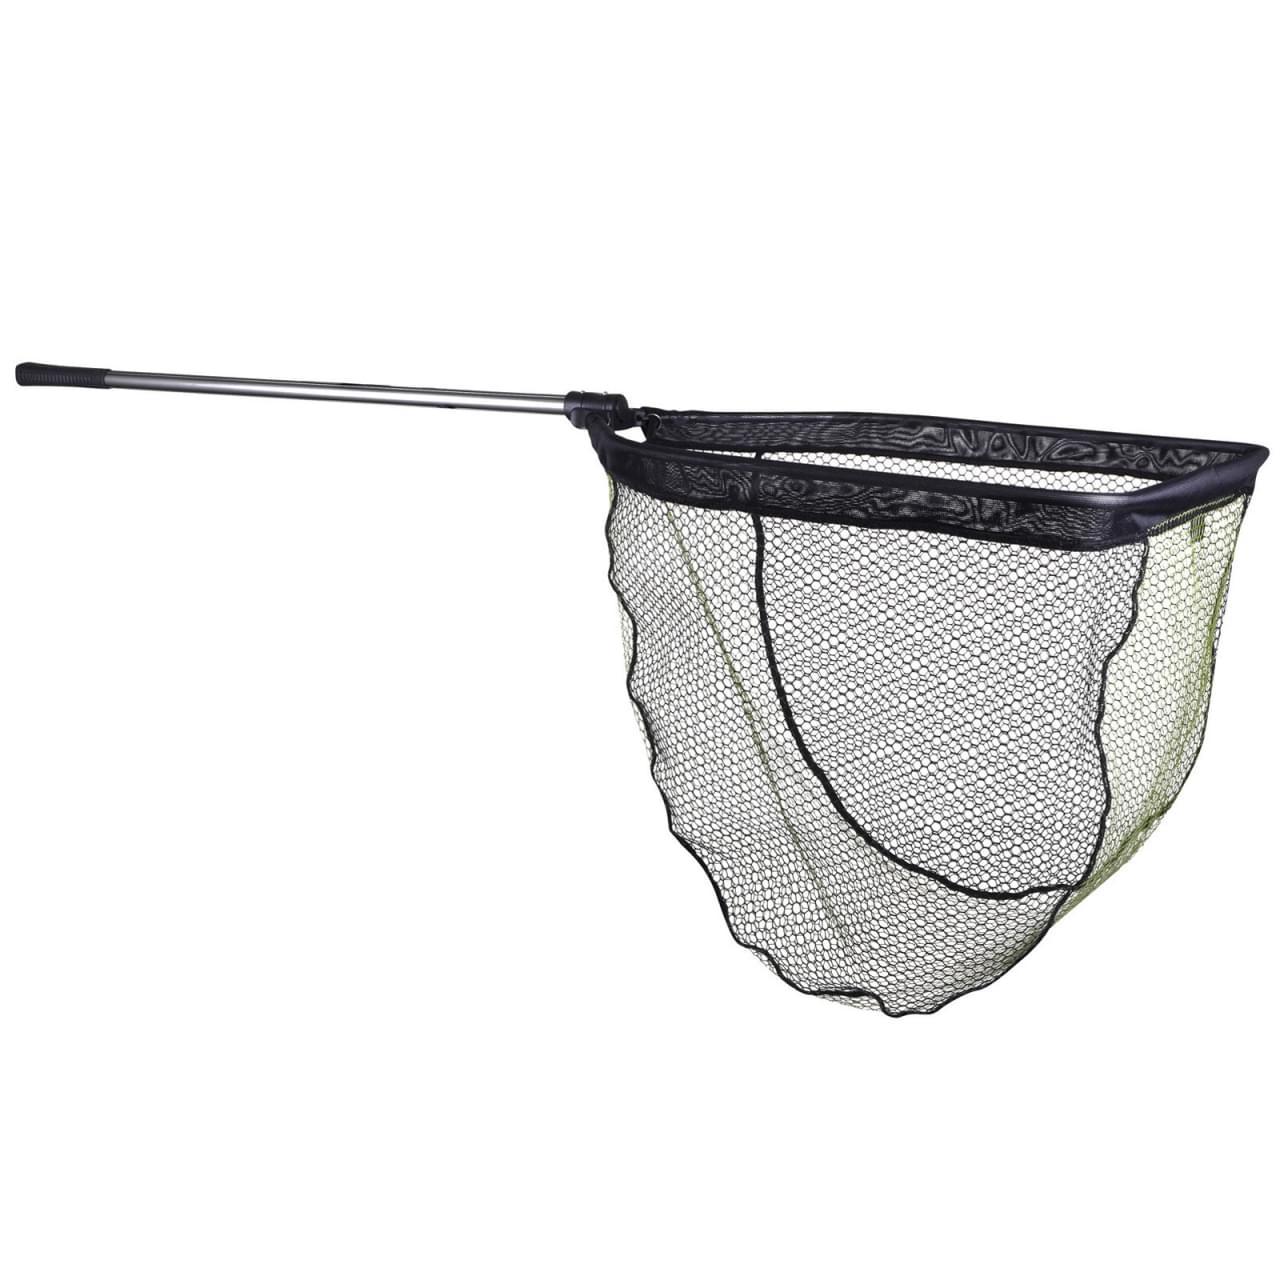 Spro Predator Folding Net